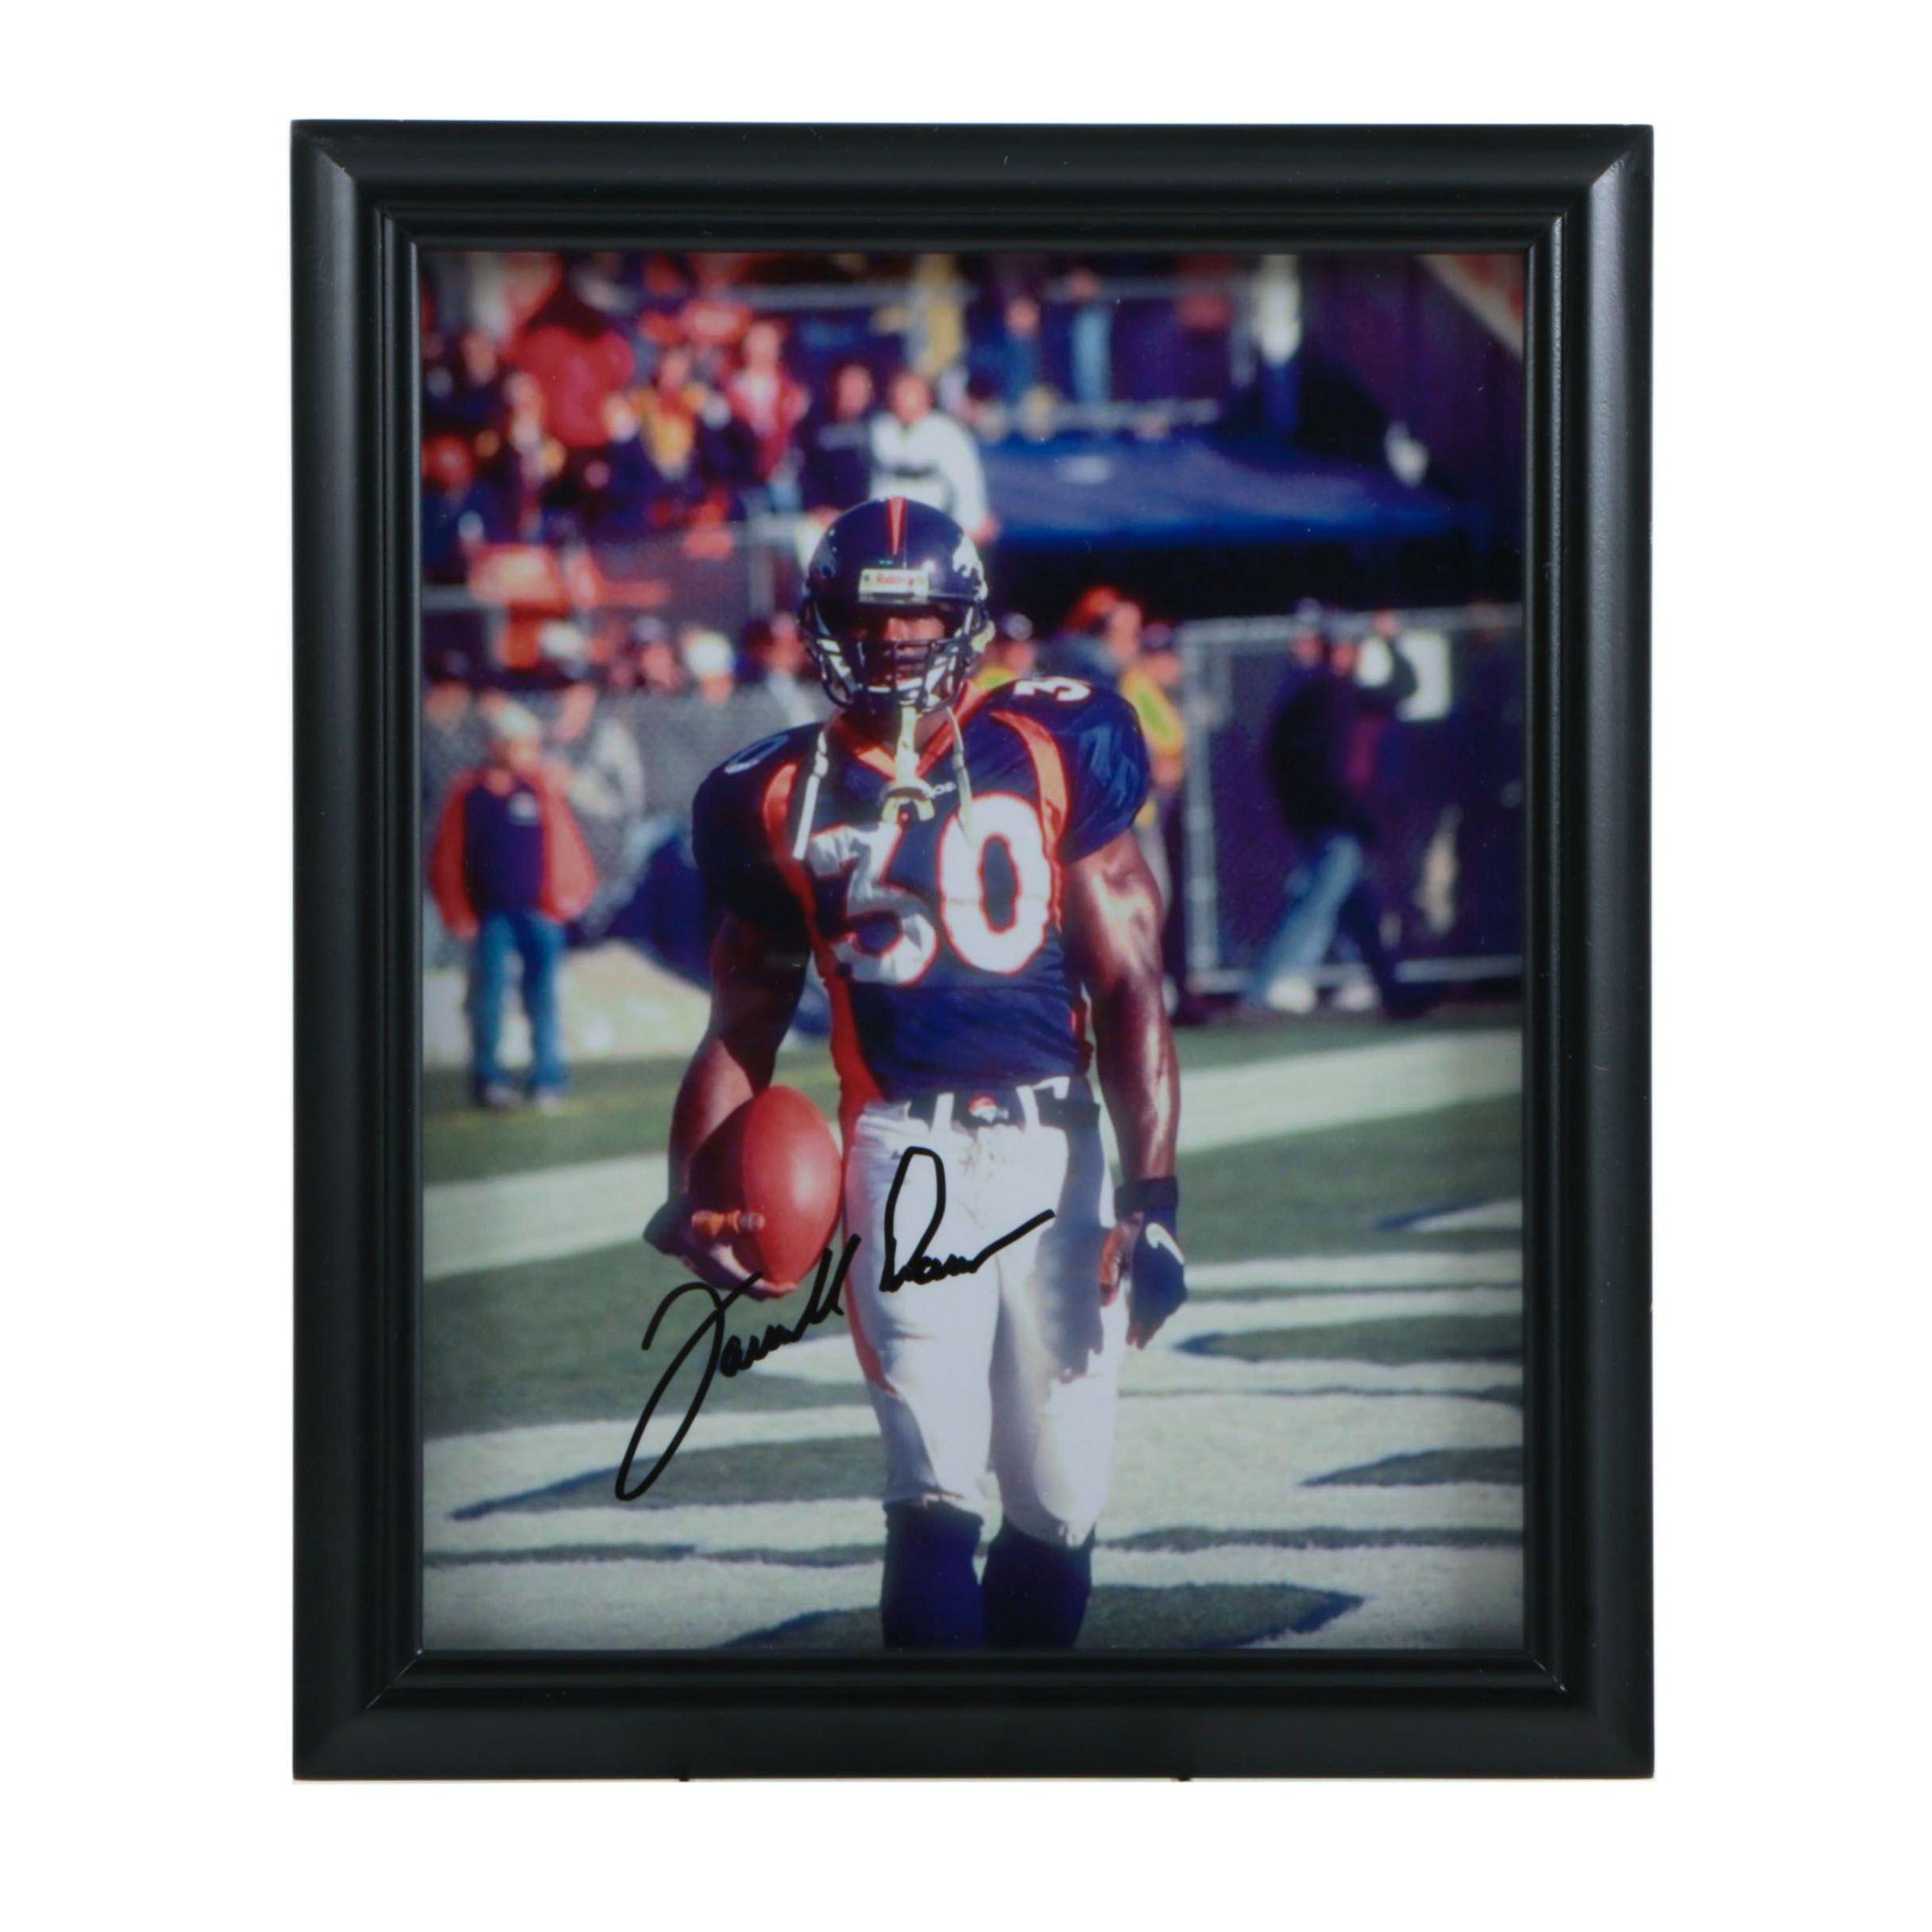 Framed Terrell Davis (HOF) Autographed Photograph